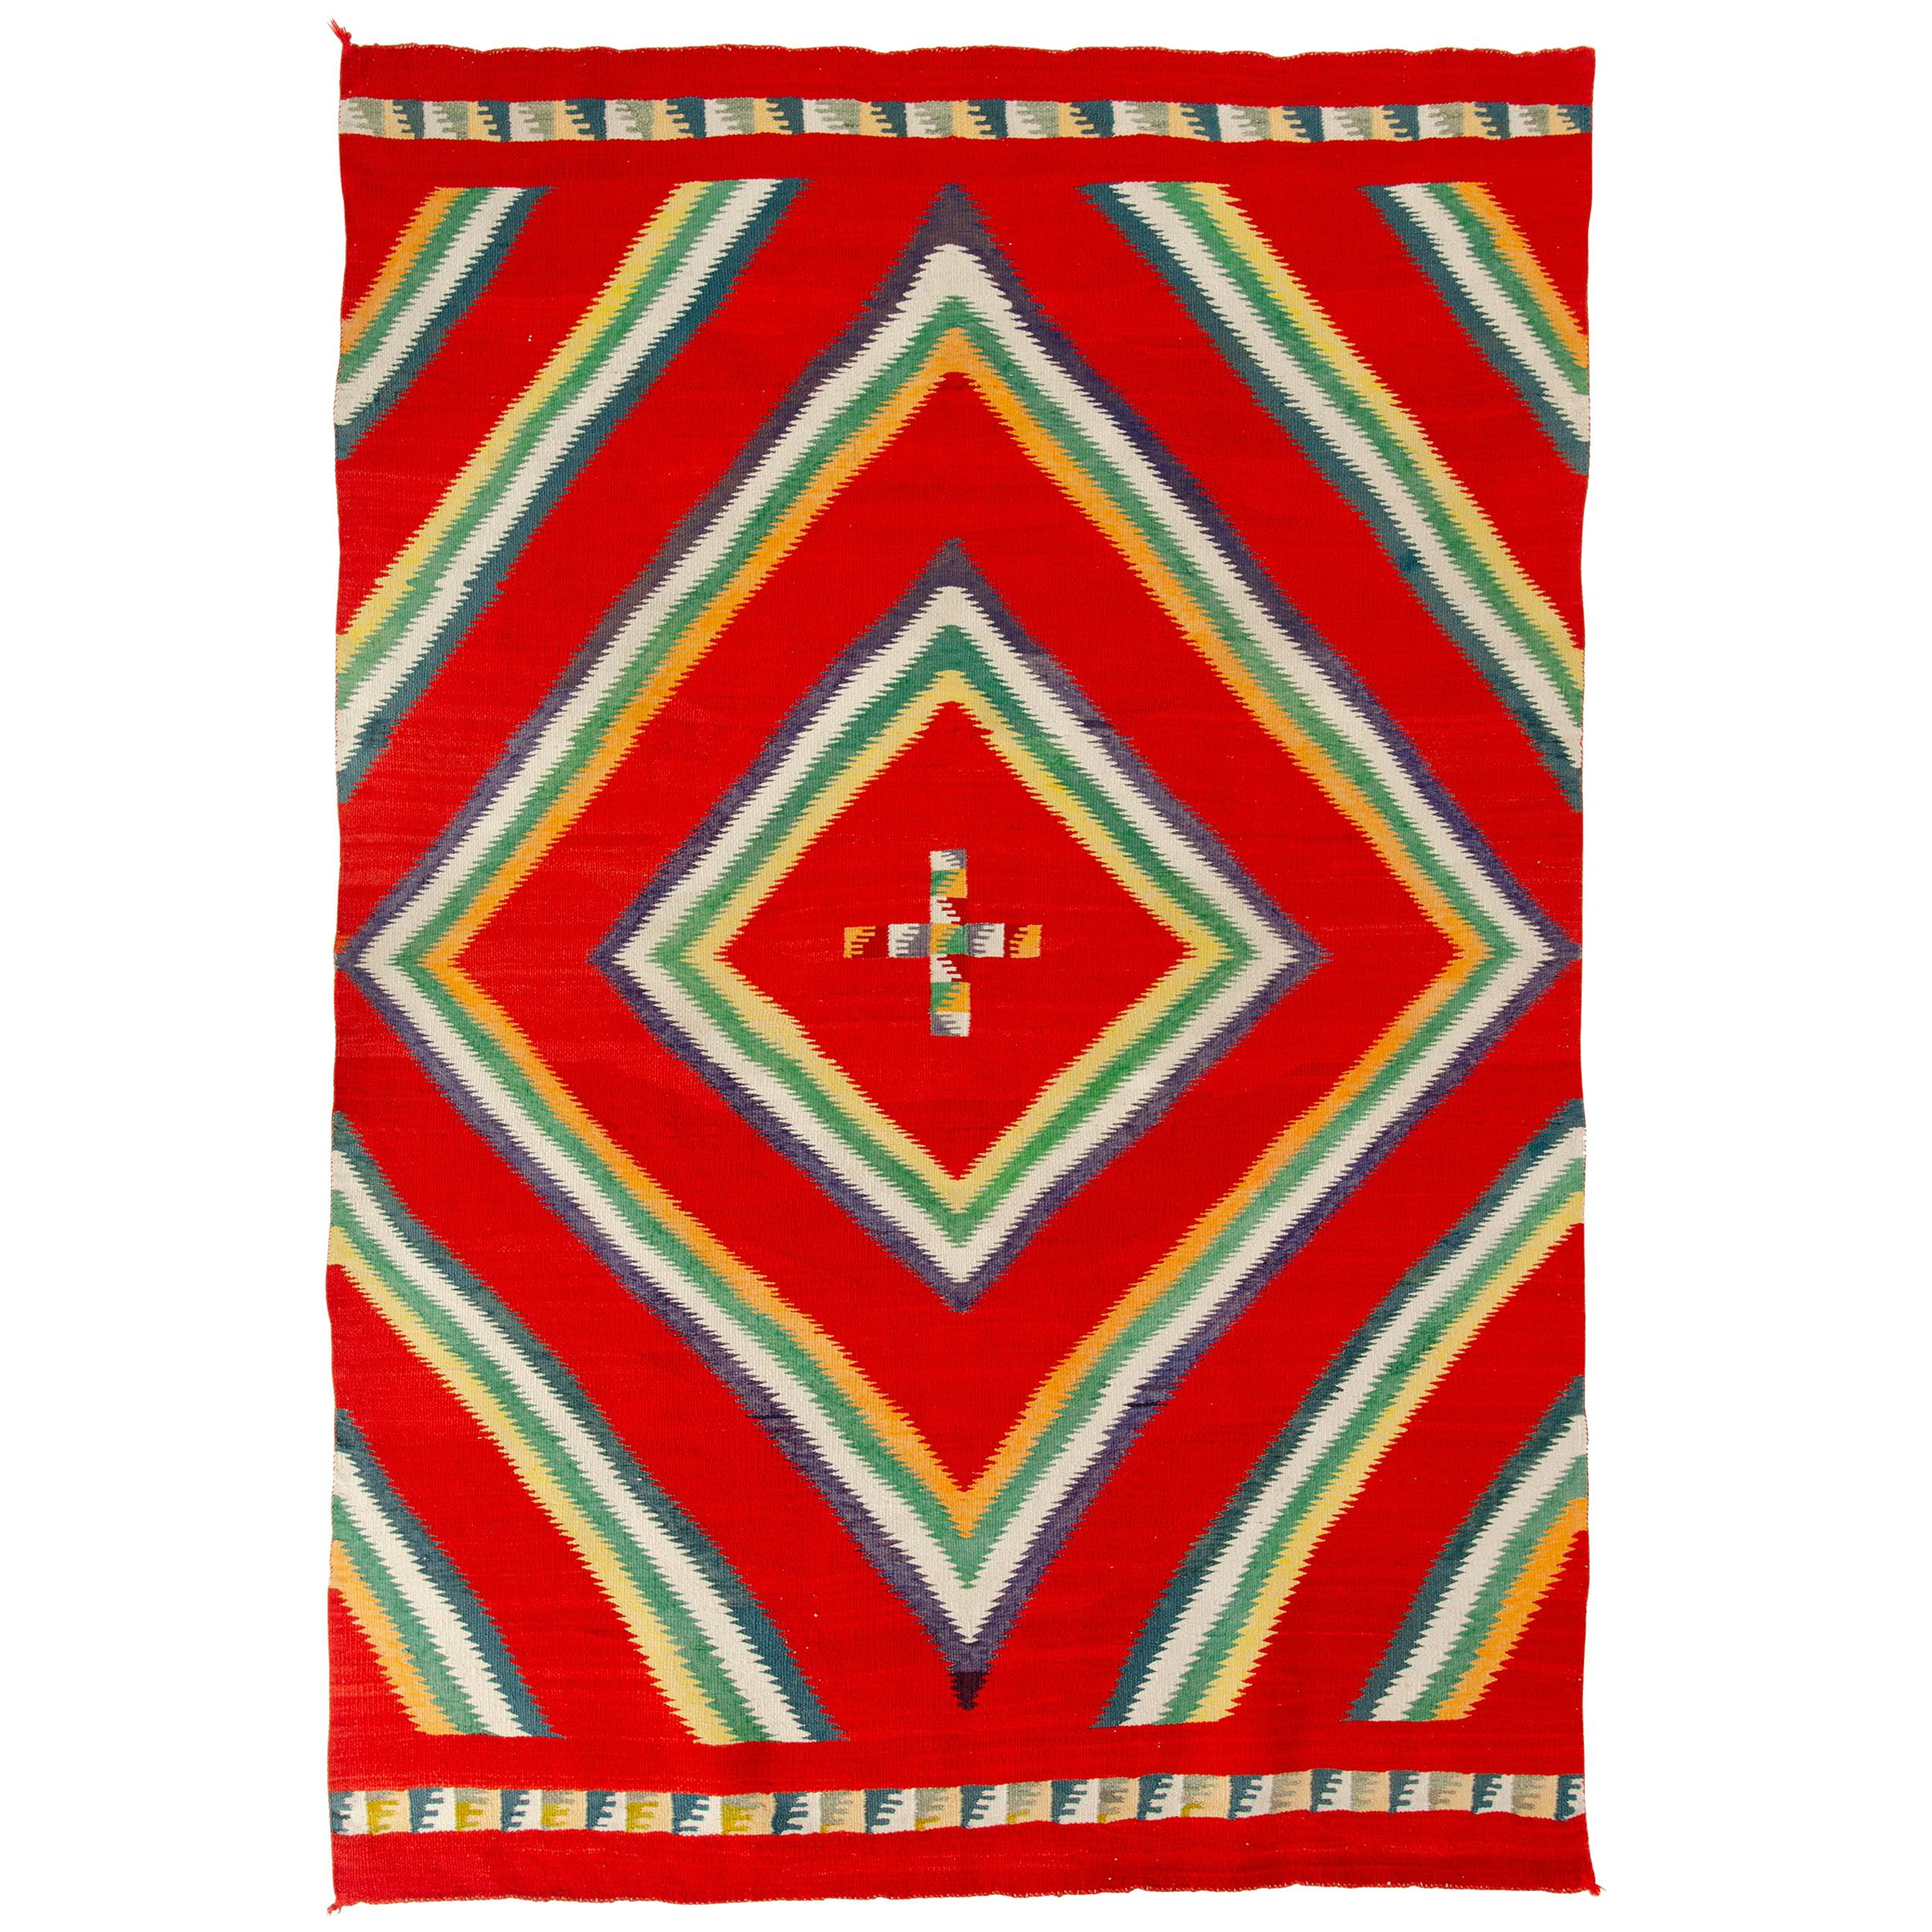 19th Century Navajo Germantown 'Eye Dazzler' Woven Rug or Wall Hanging